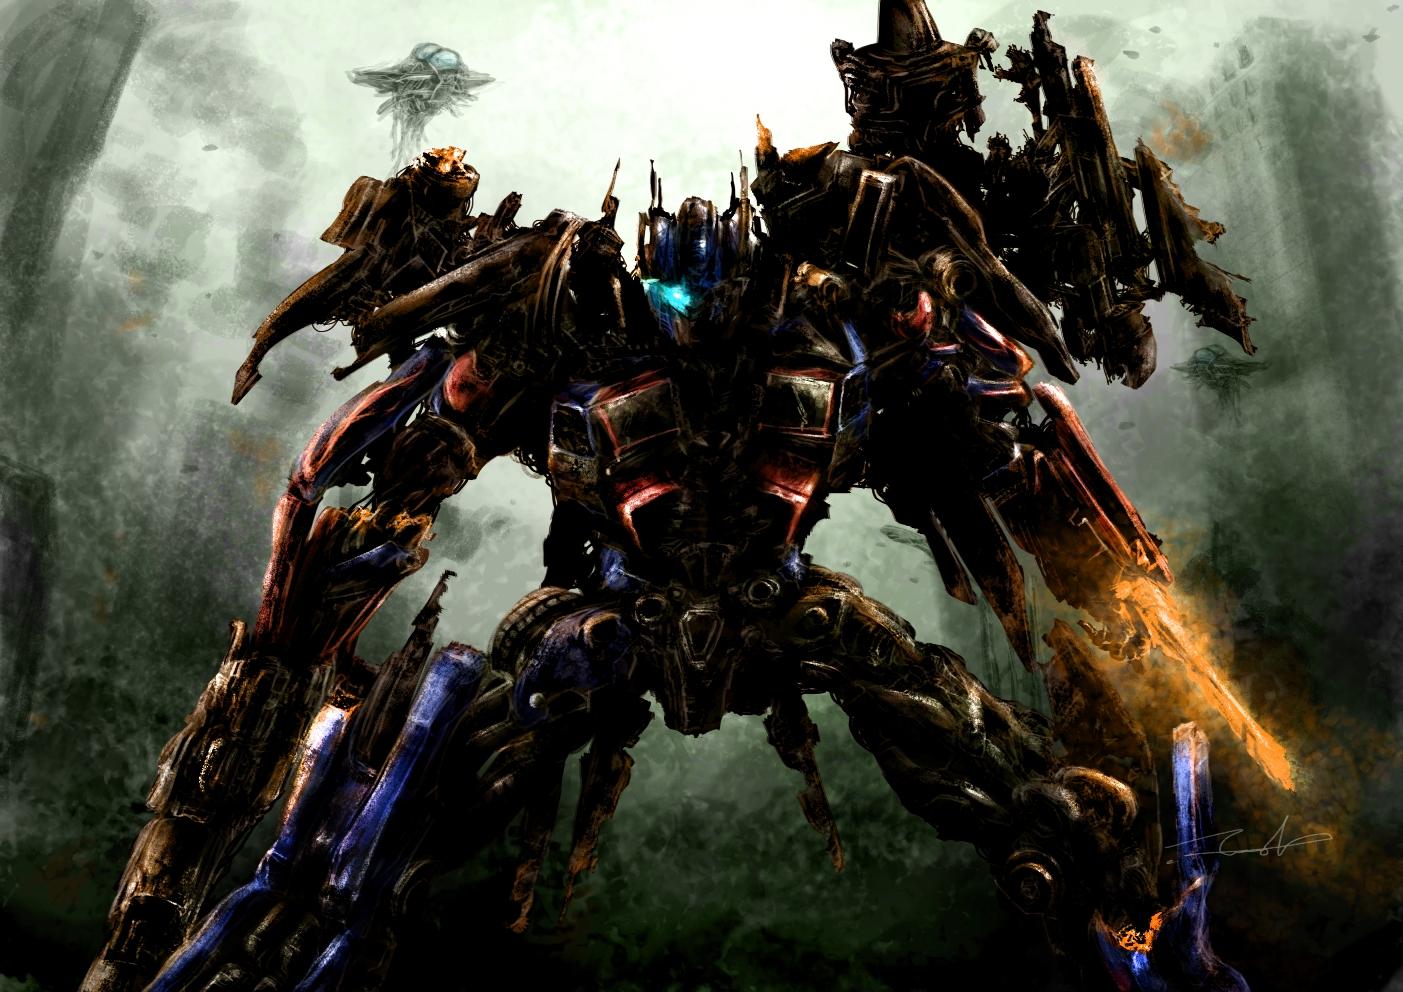 optimus prime - transformers - zerochan anime image board